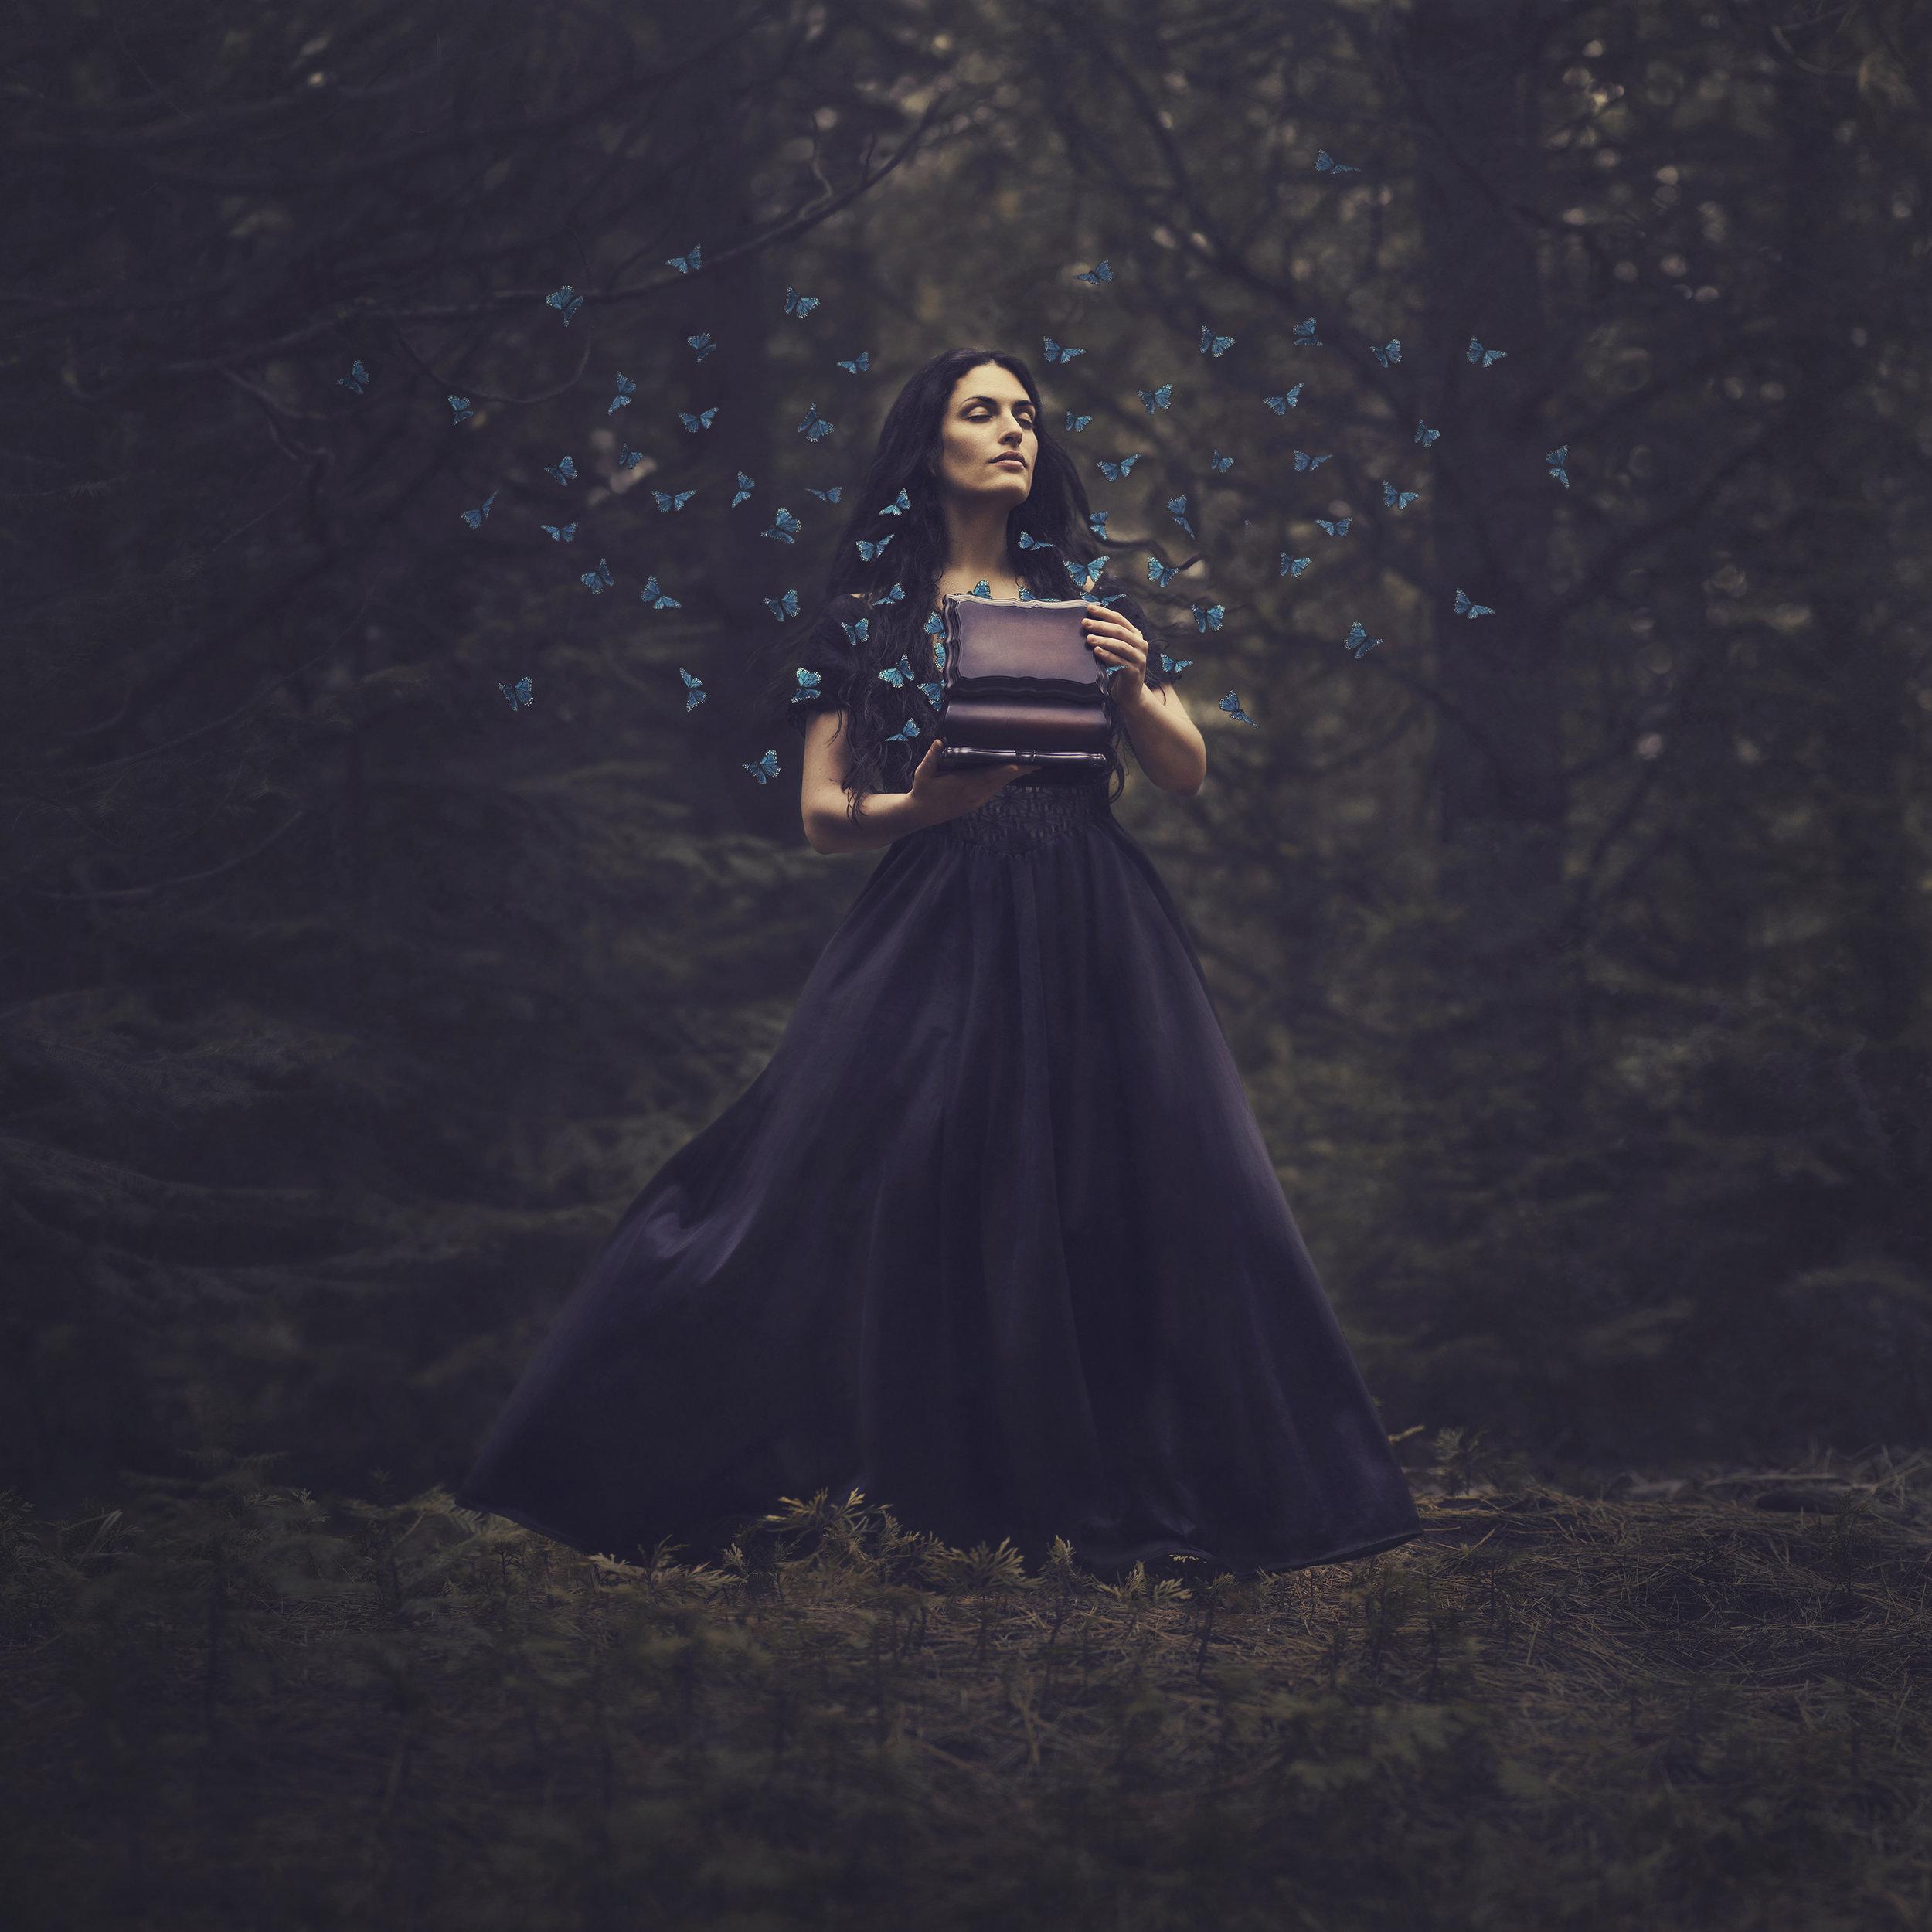 Marya_stark_butterfly_parvana_photography_composite_photoshop_storytelling.jpg